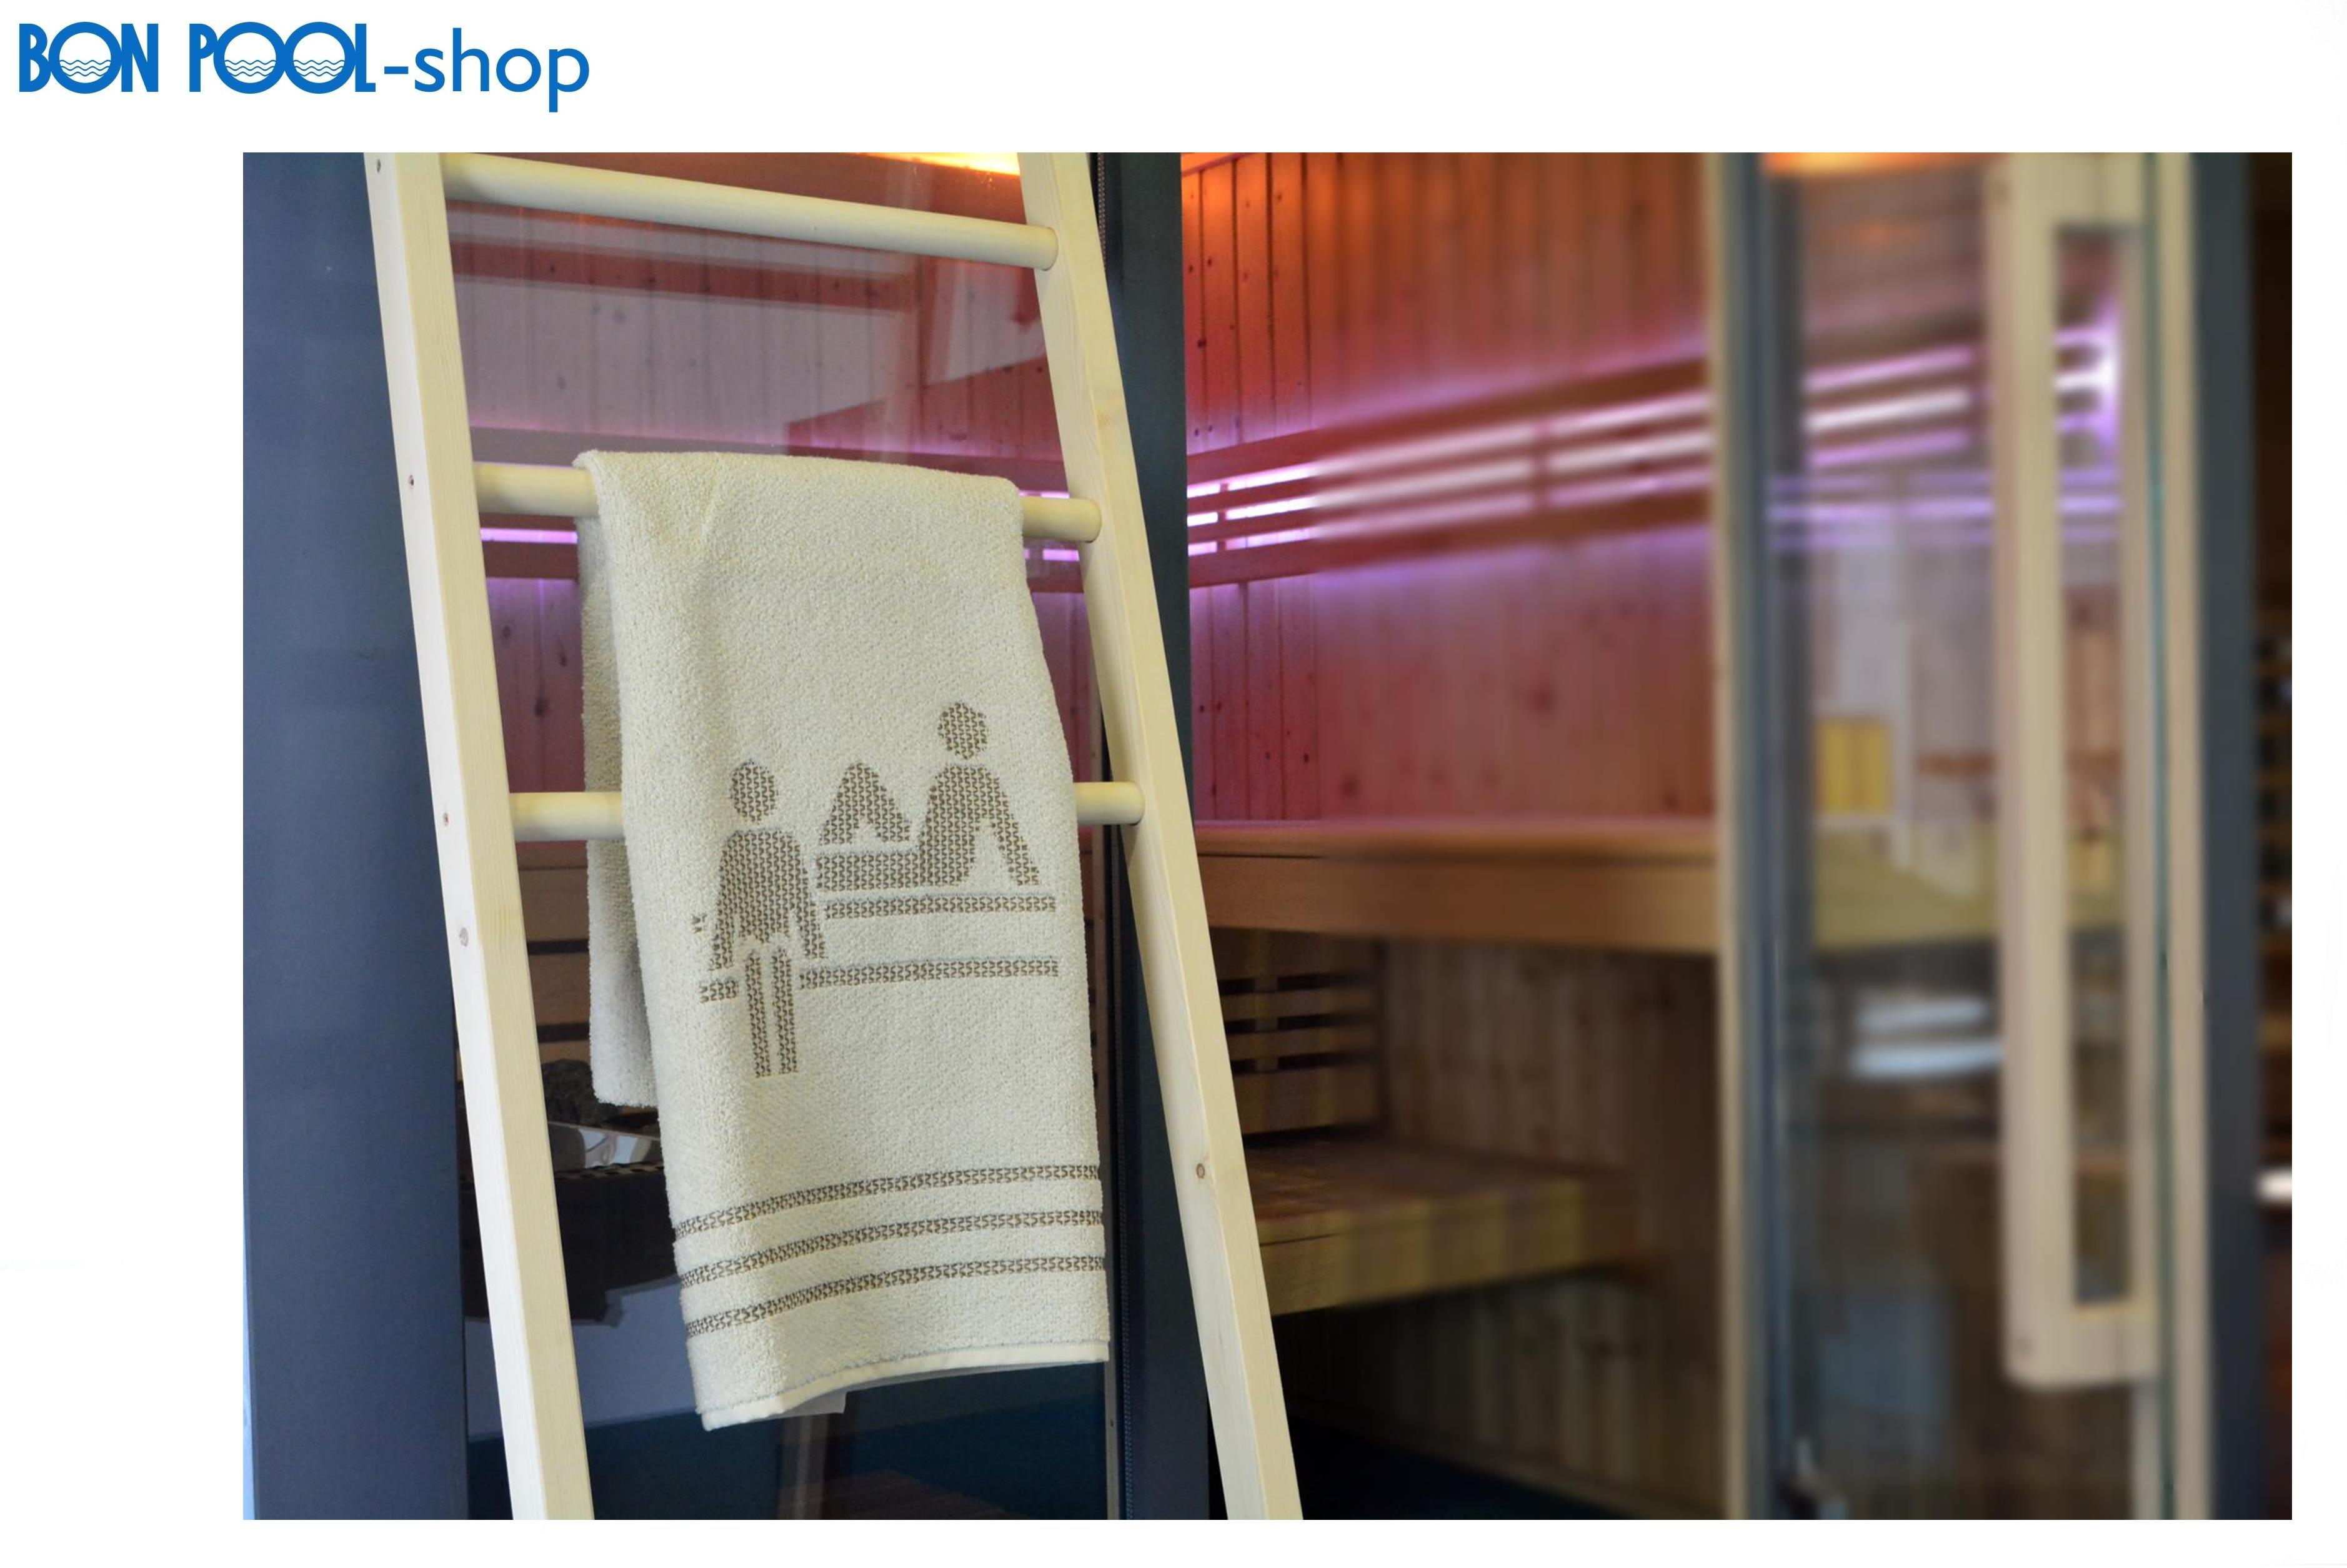 sauna handtuch perfect sauna individuell with sauna. Black Bedroom Furniture Sets. Home Design Ideas